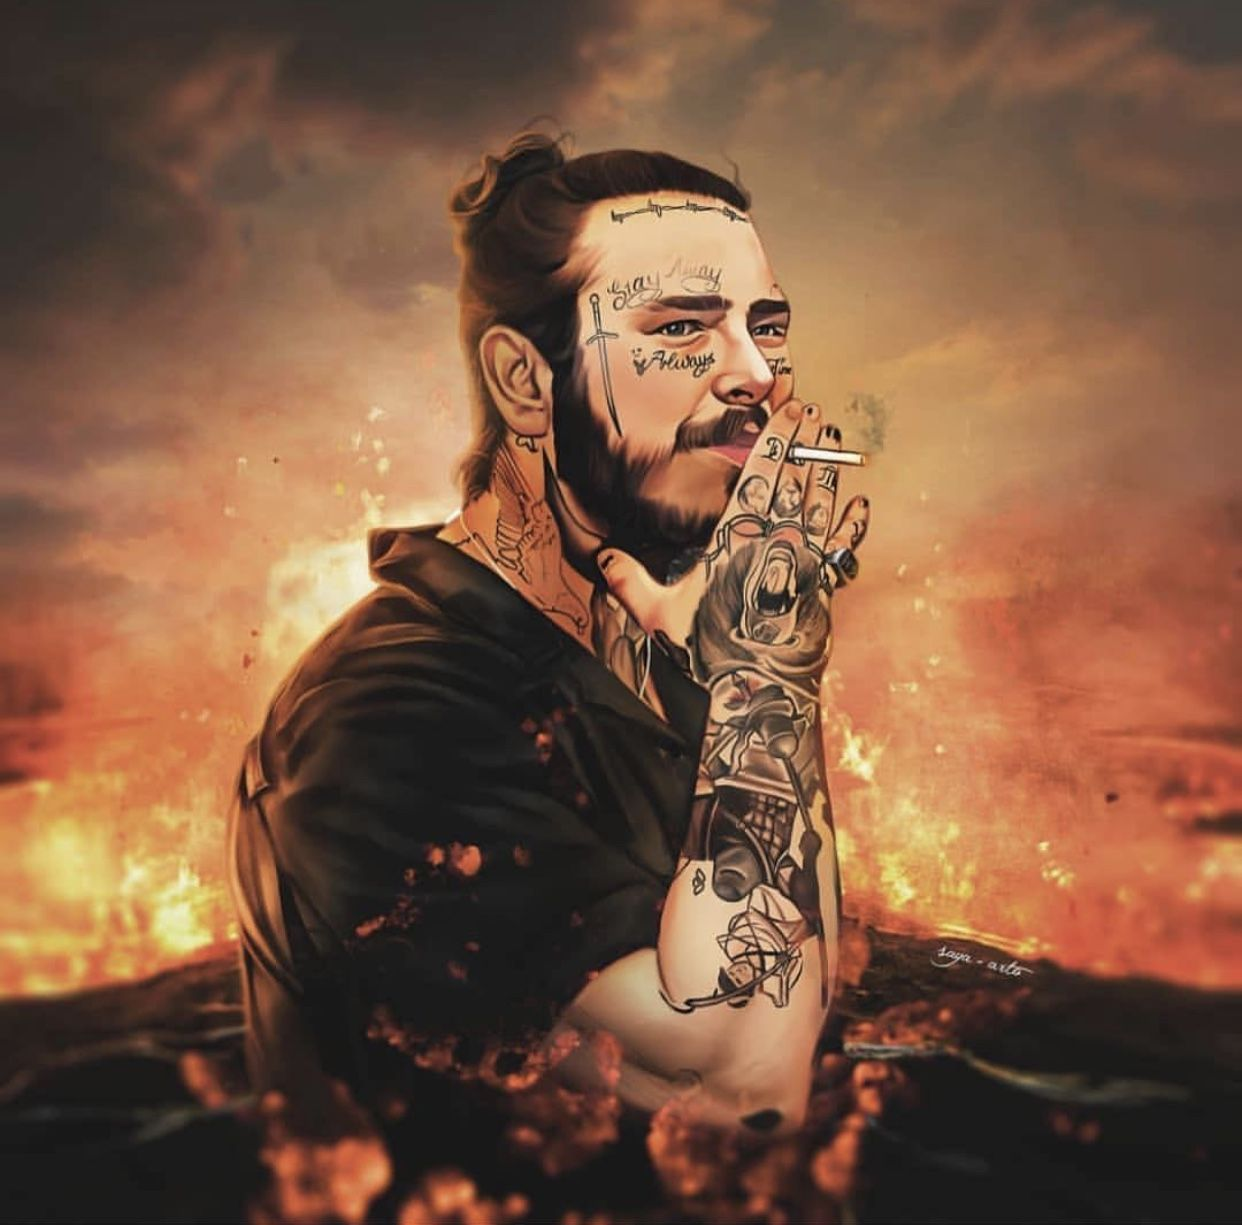 Rapper art image by koryn on austin richard post